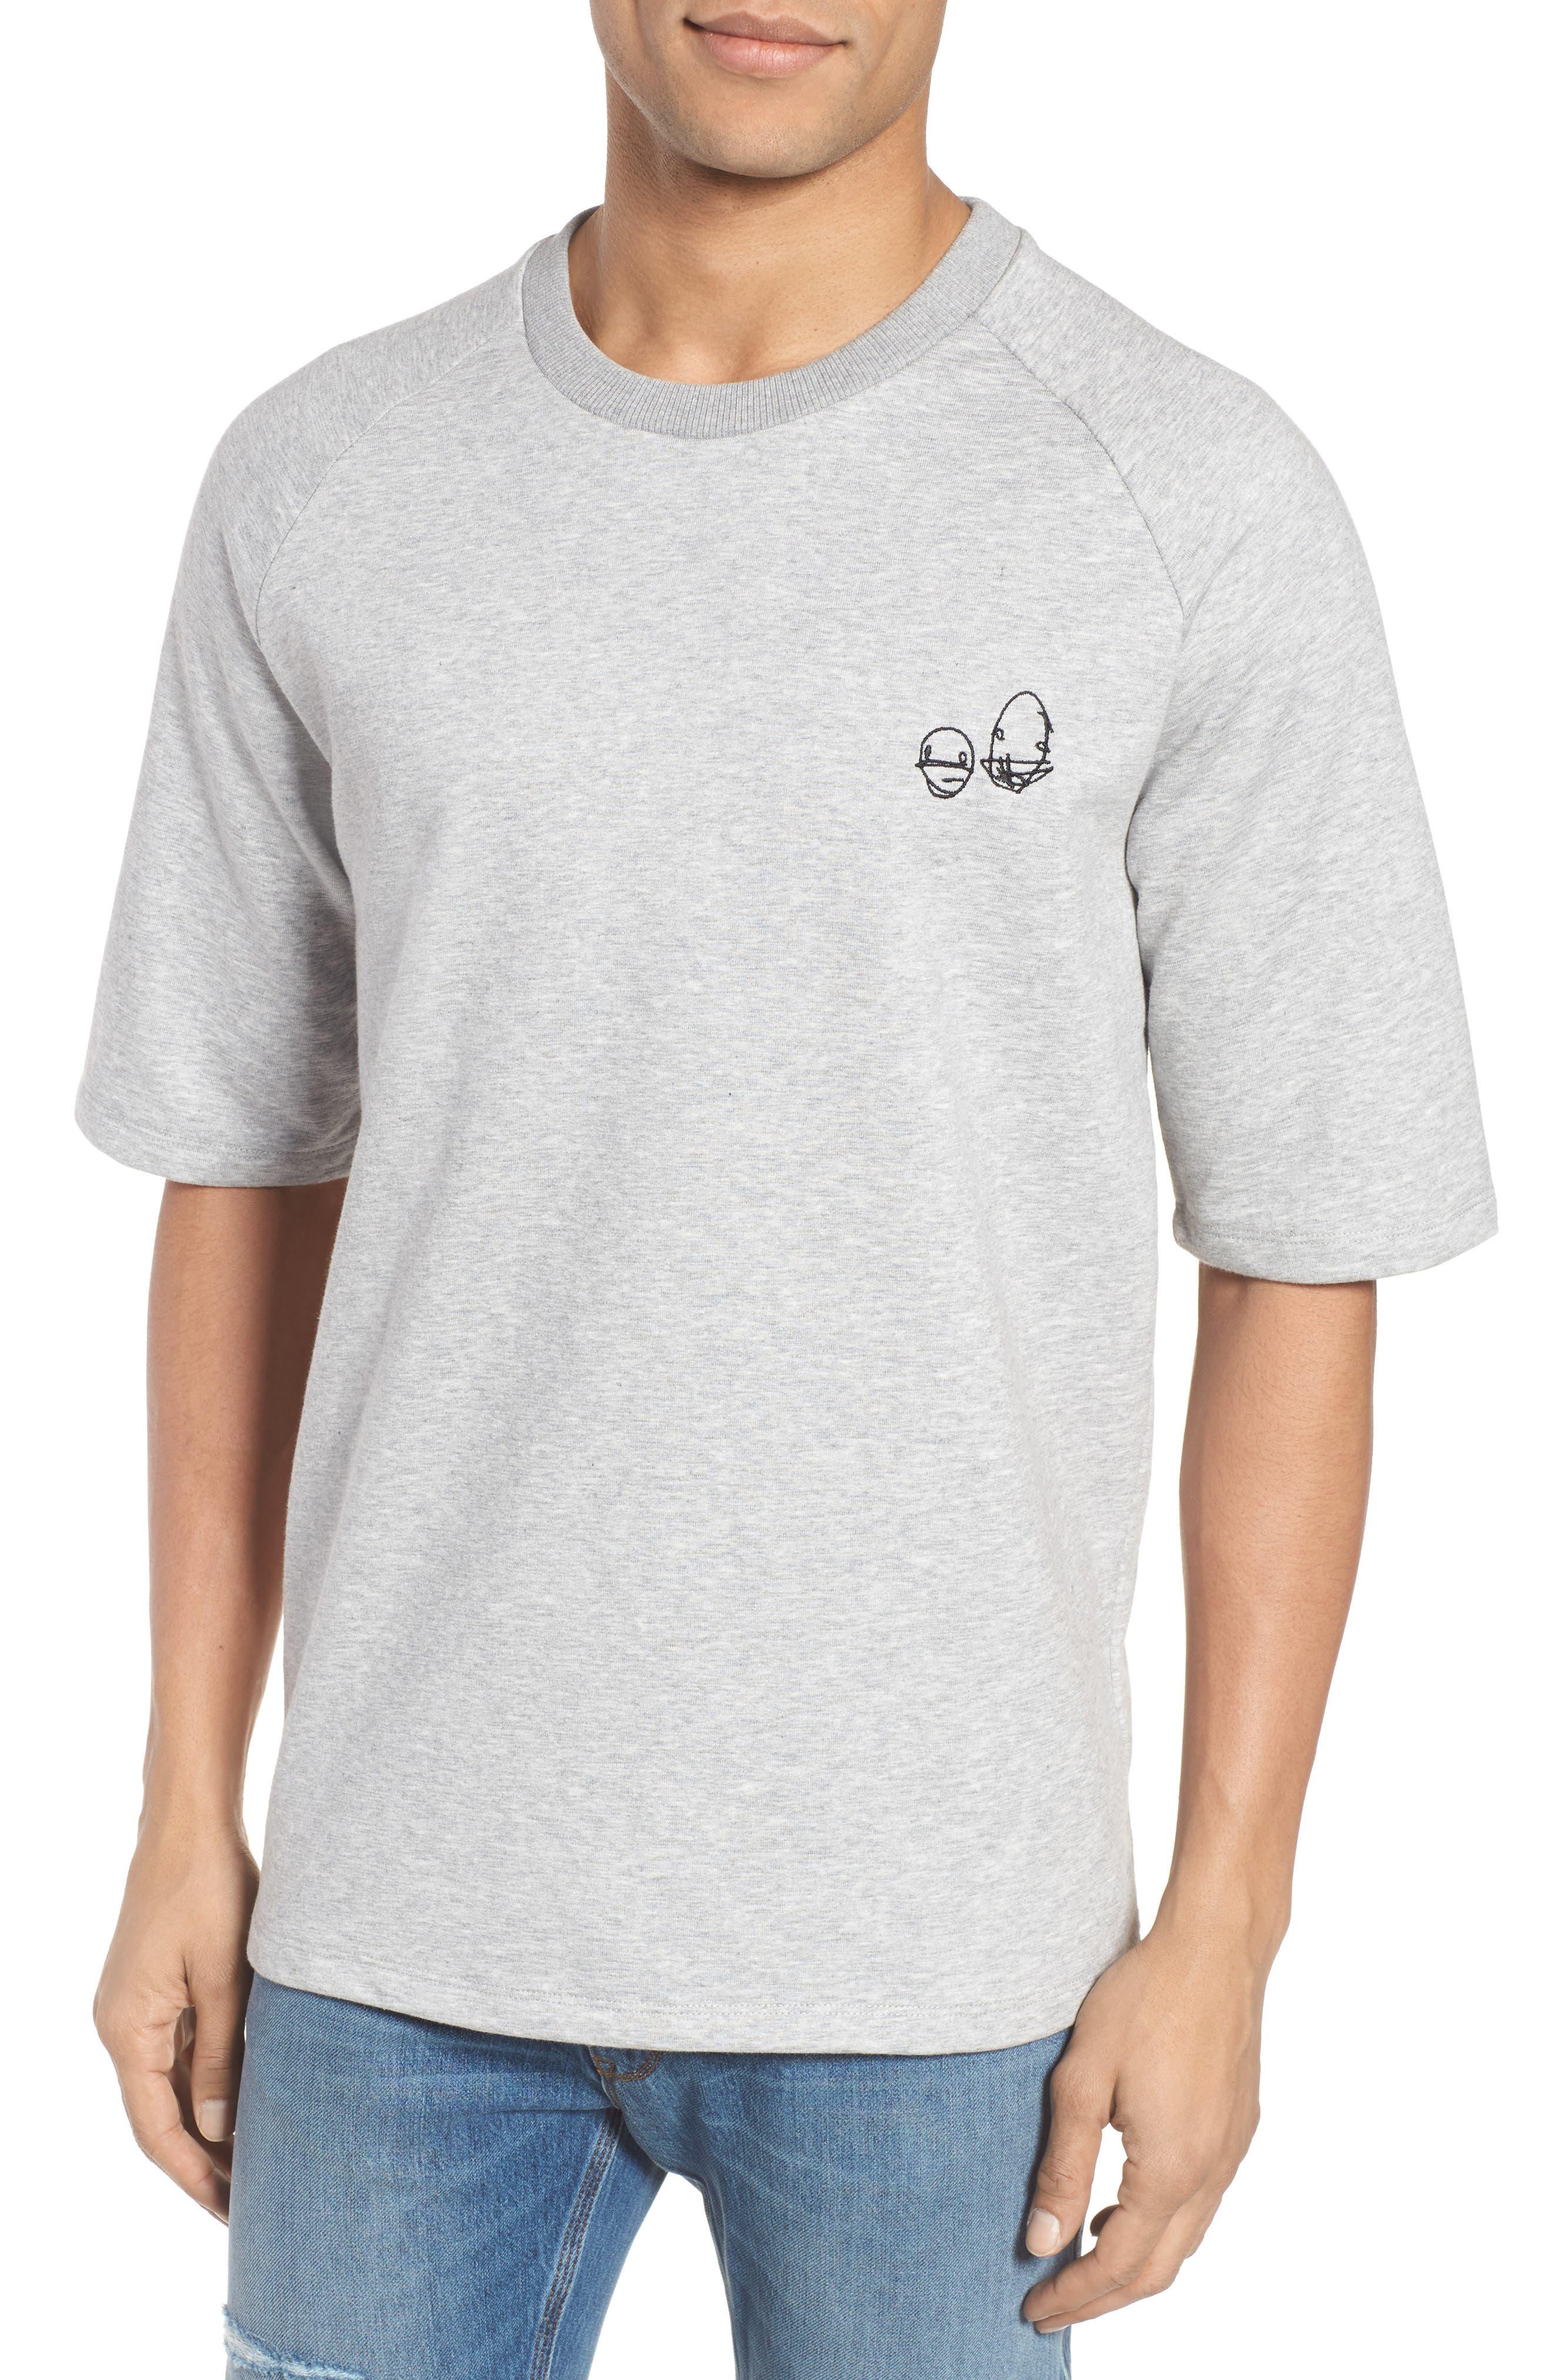 Deast Doodle Sweatshirt,                             Main thumbnail 1, color,                             061